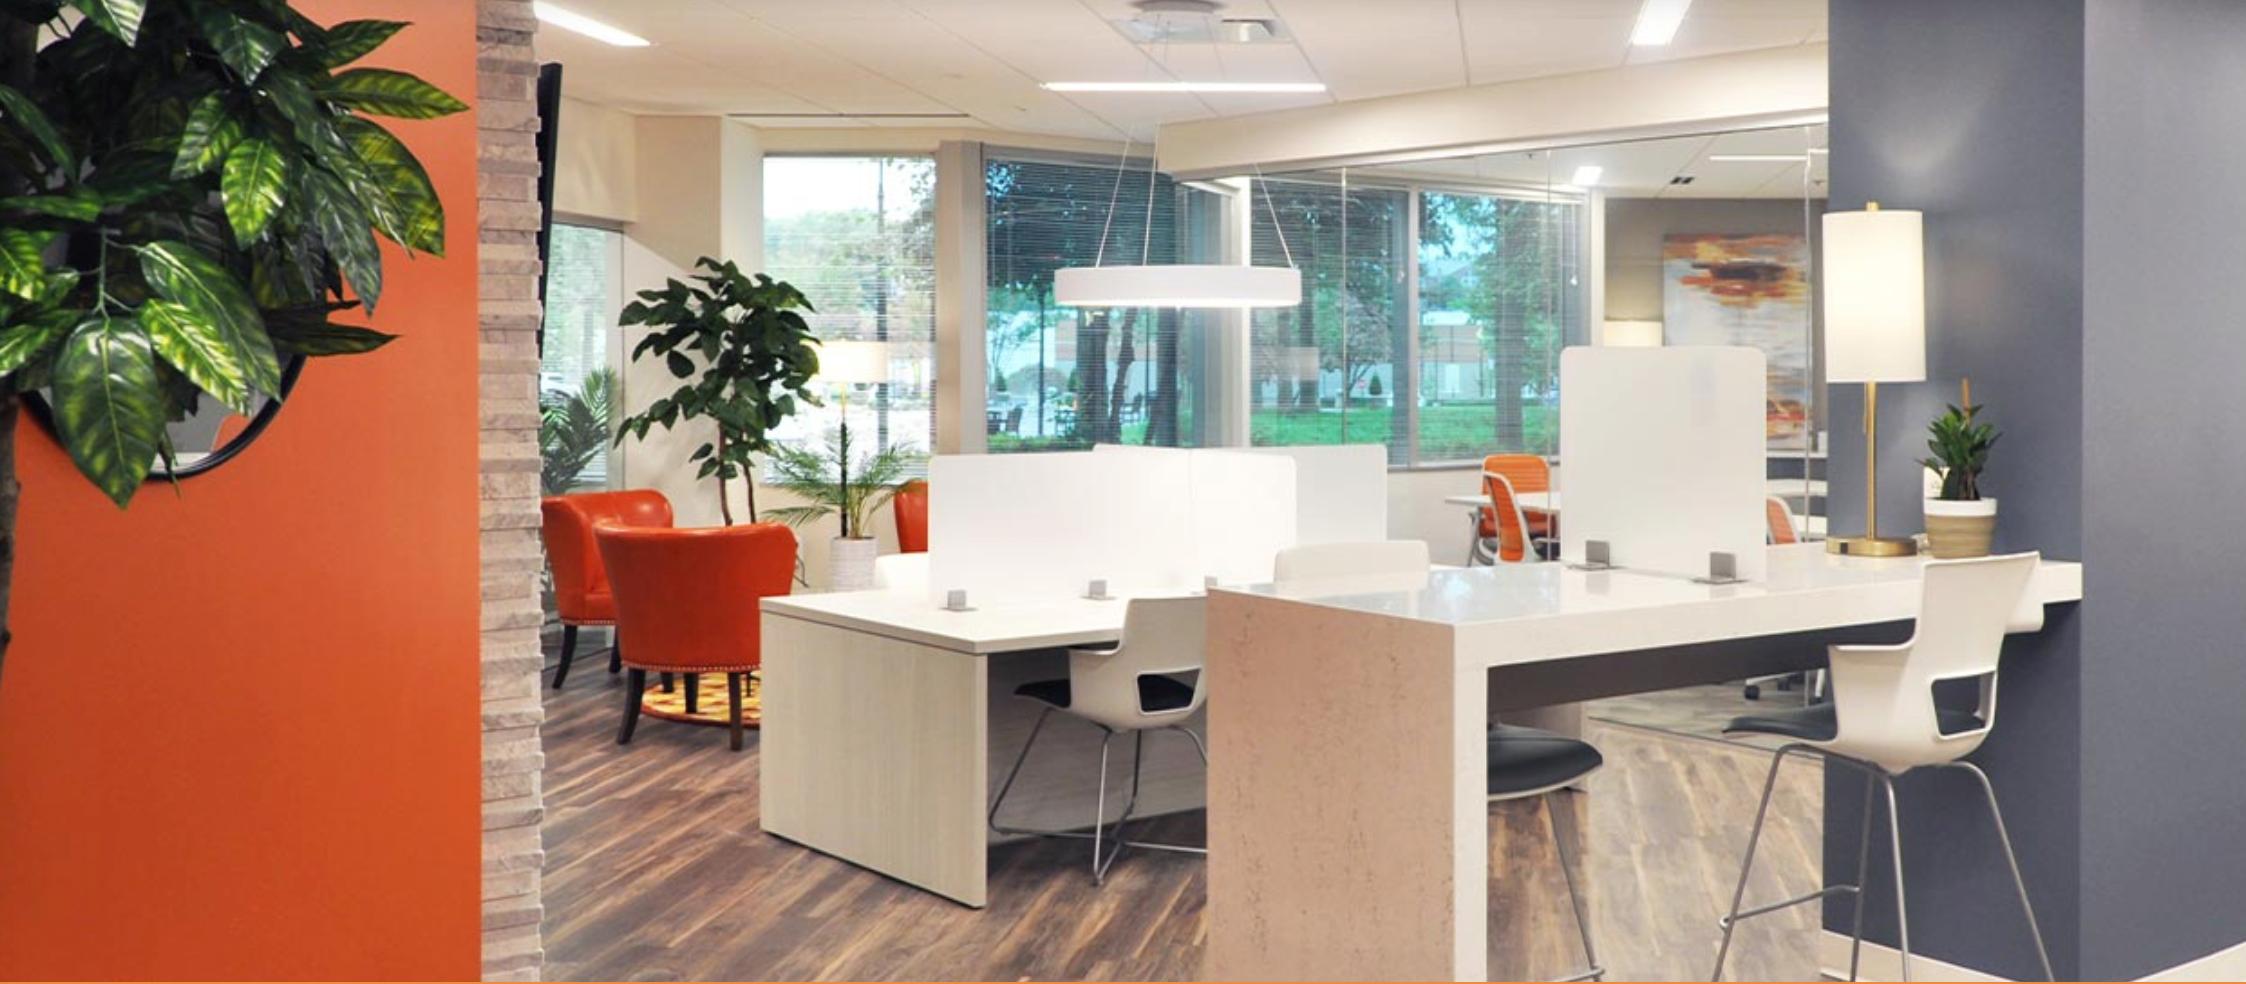 Office Evolution - Fairfax, VA reviews | Shared Office Spaces at 10304 Eaton Pl Suite 100 - Fairfax VA